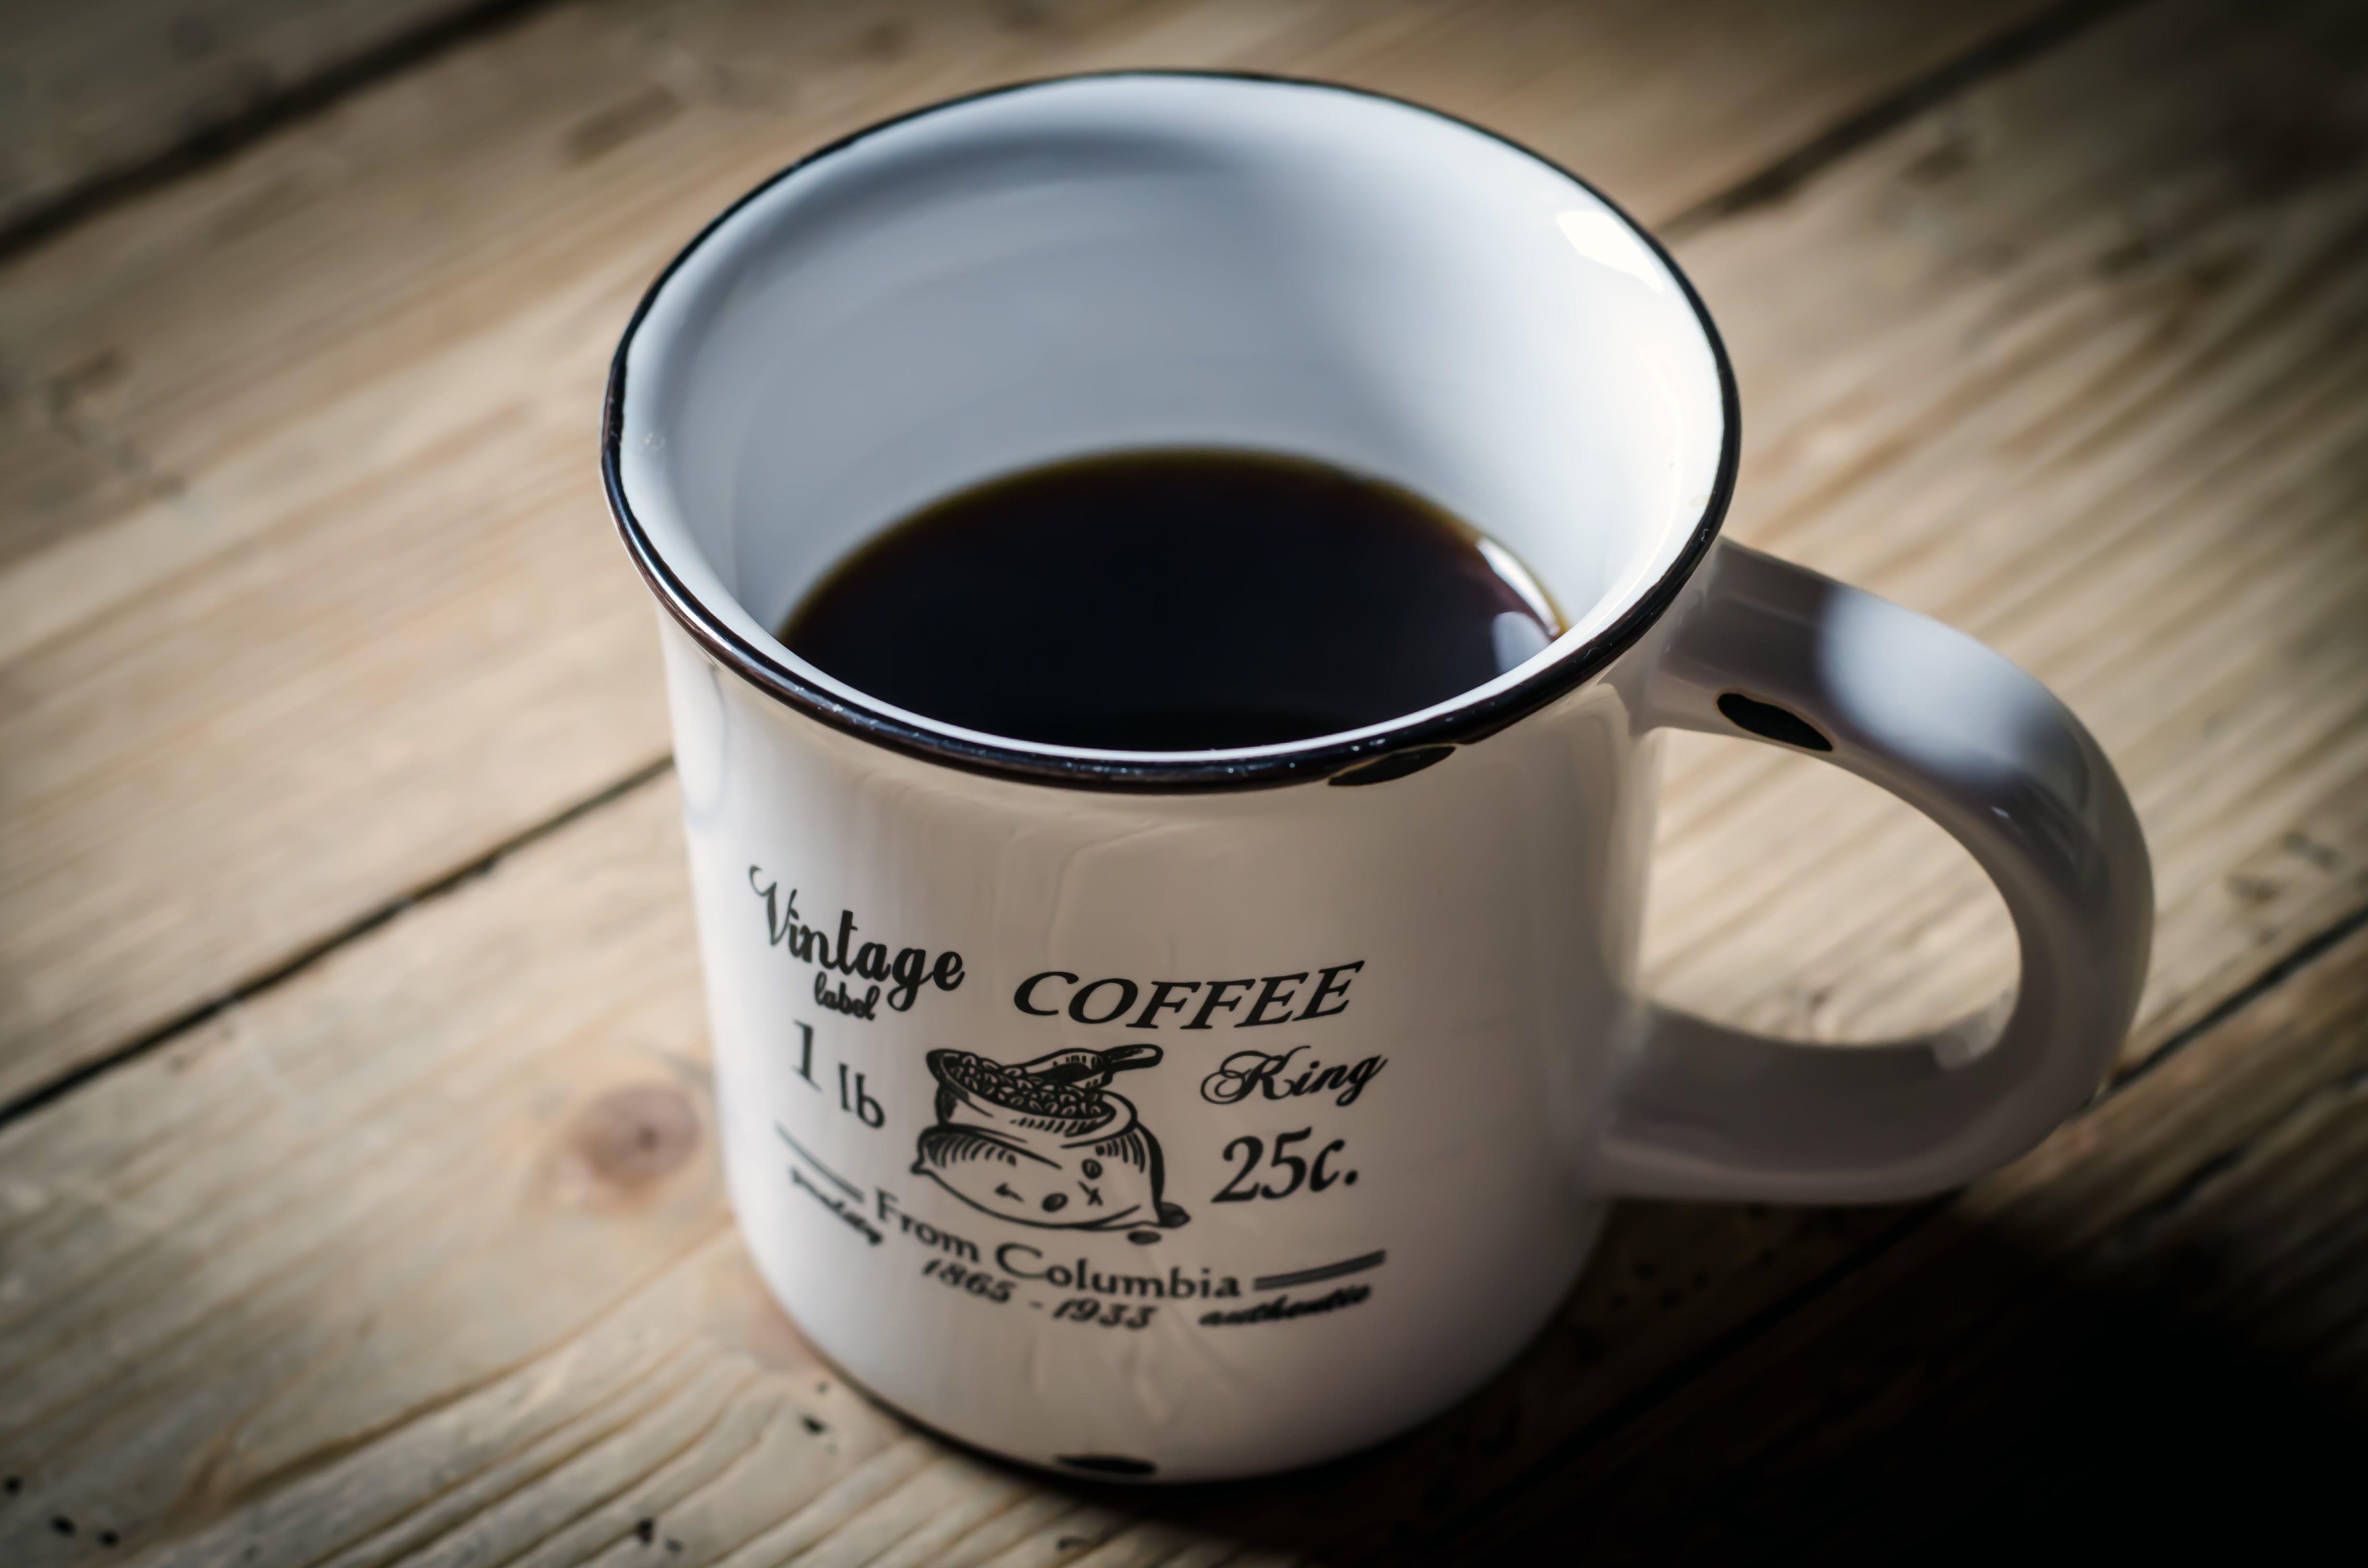 White and Black Mug With Black Liqour